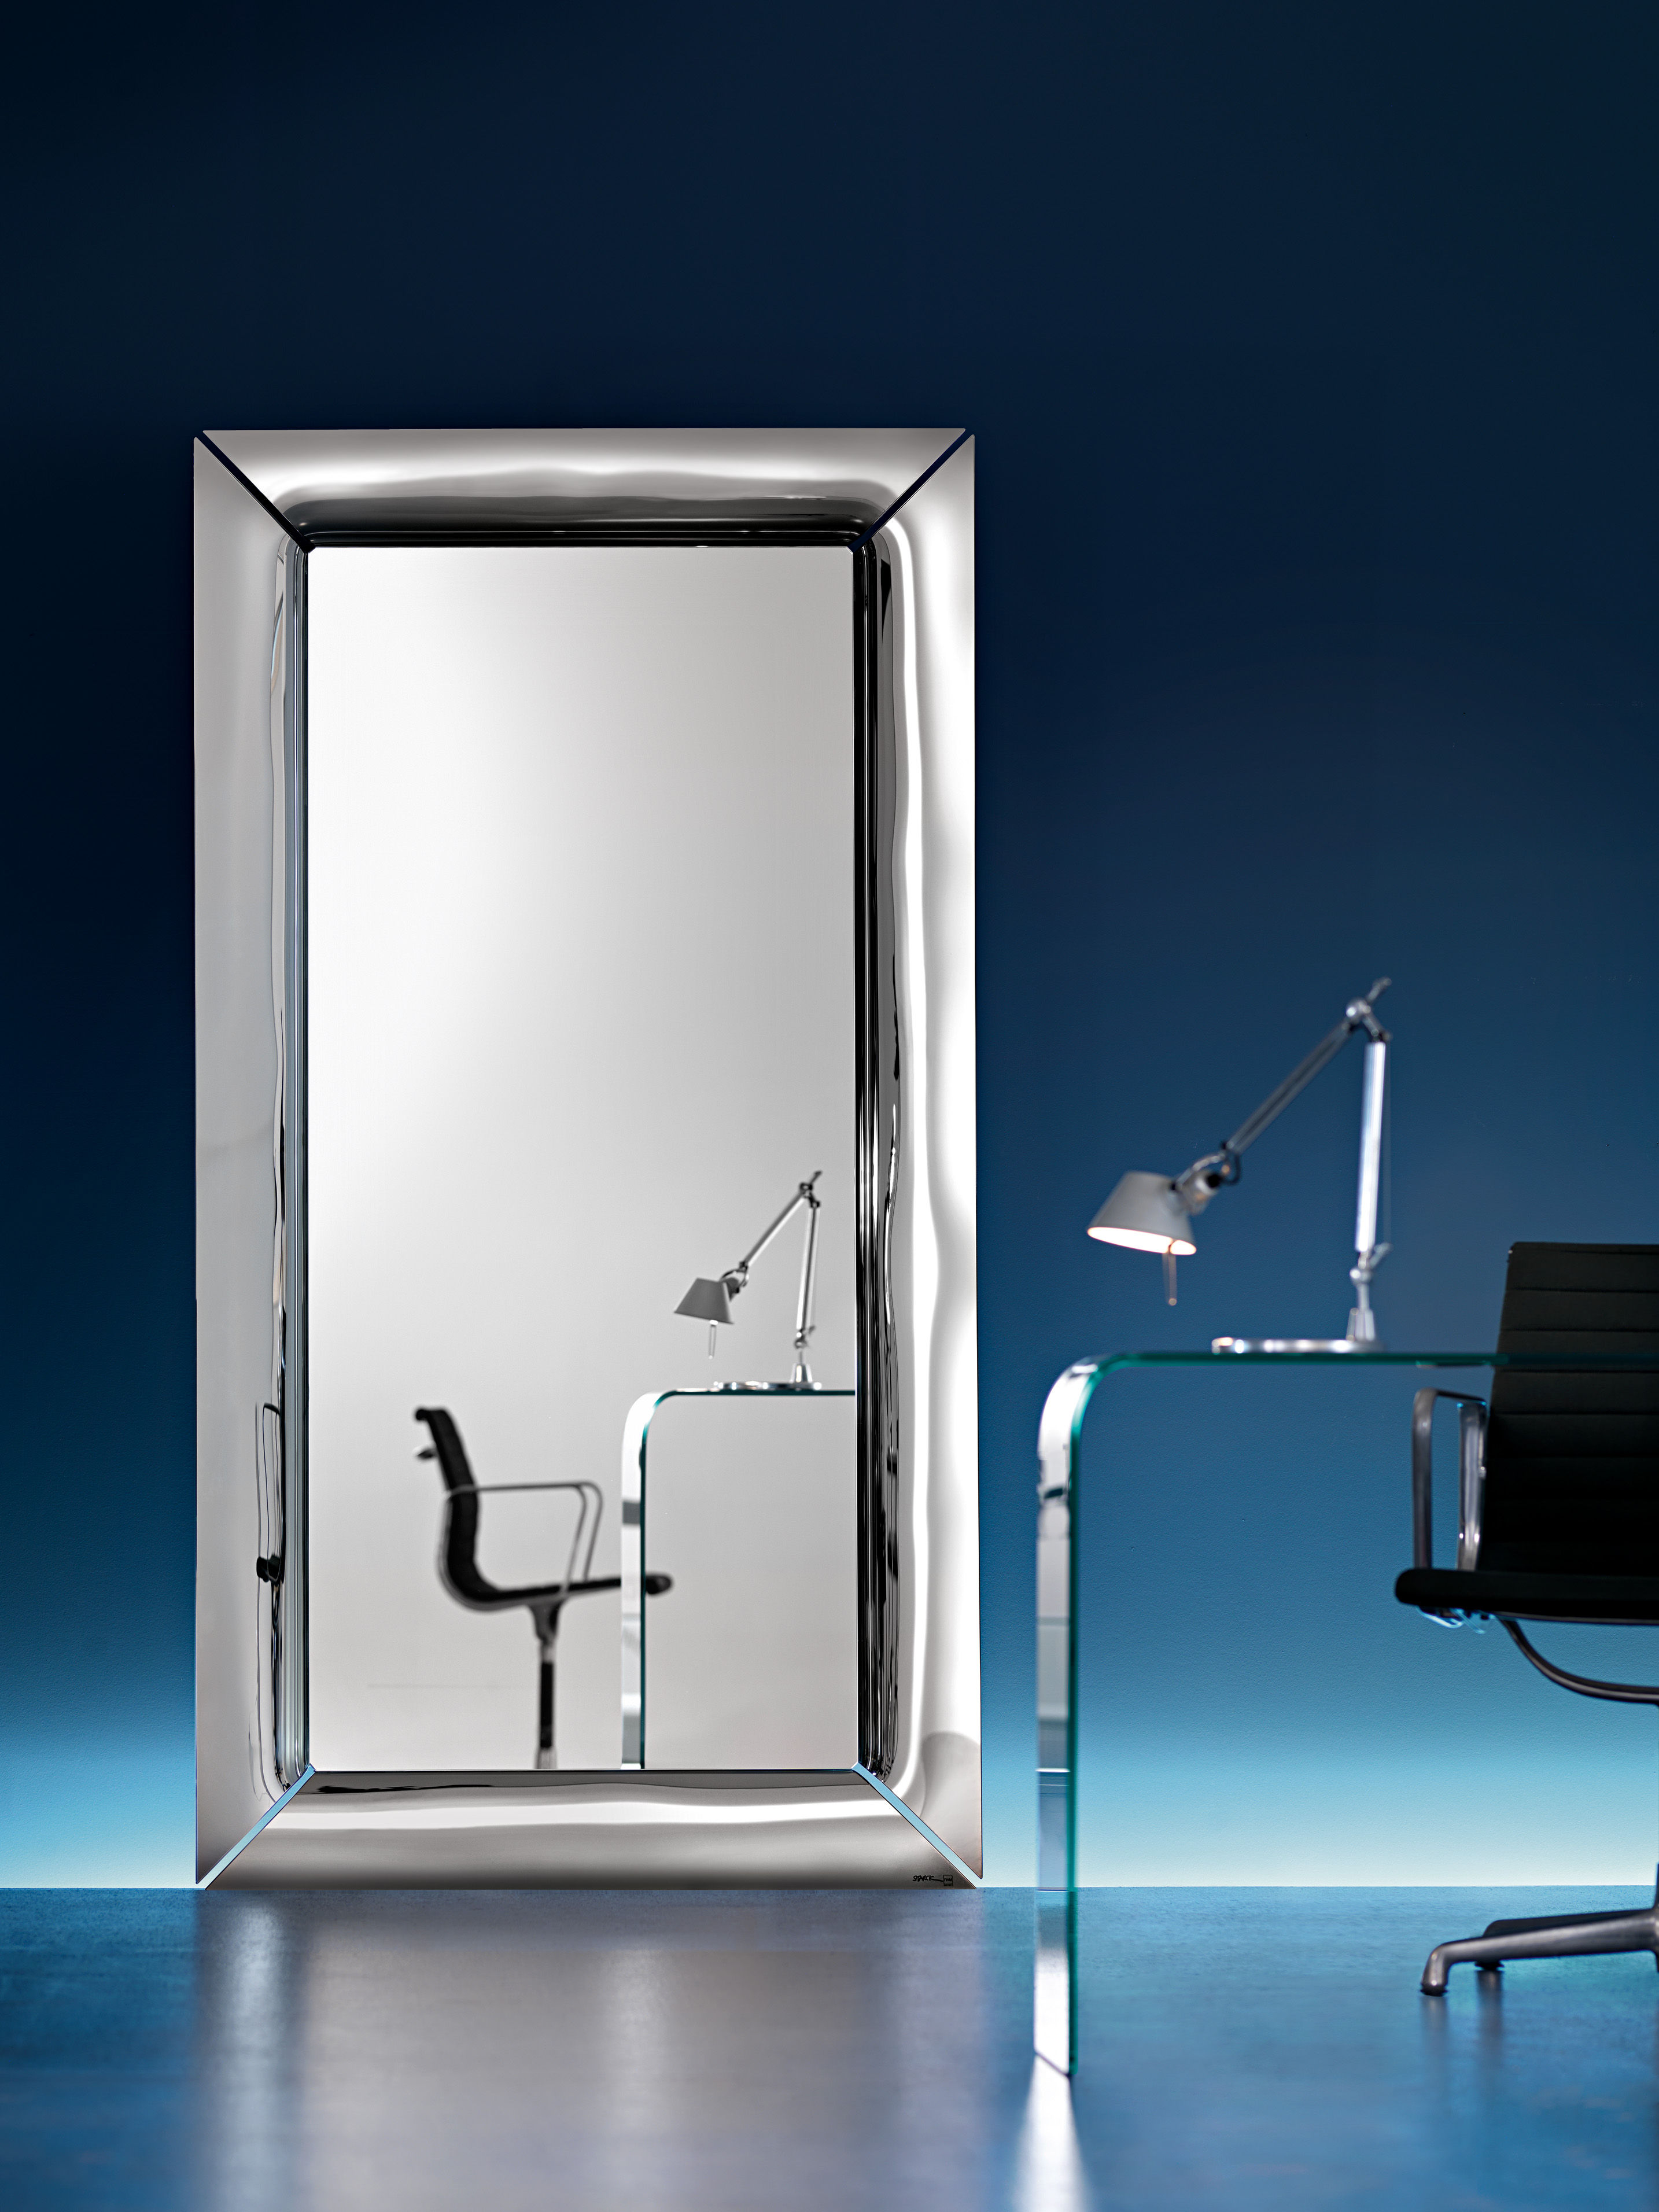 Miroir poser caadre 105 x 195 cm 105 x 195 cm for Miroir caadre philippe starck